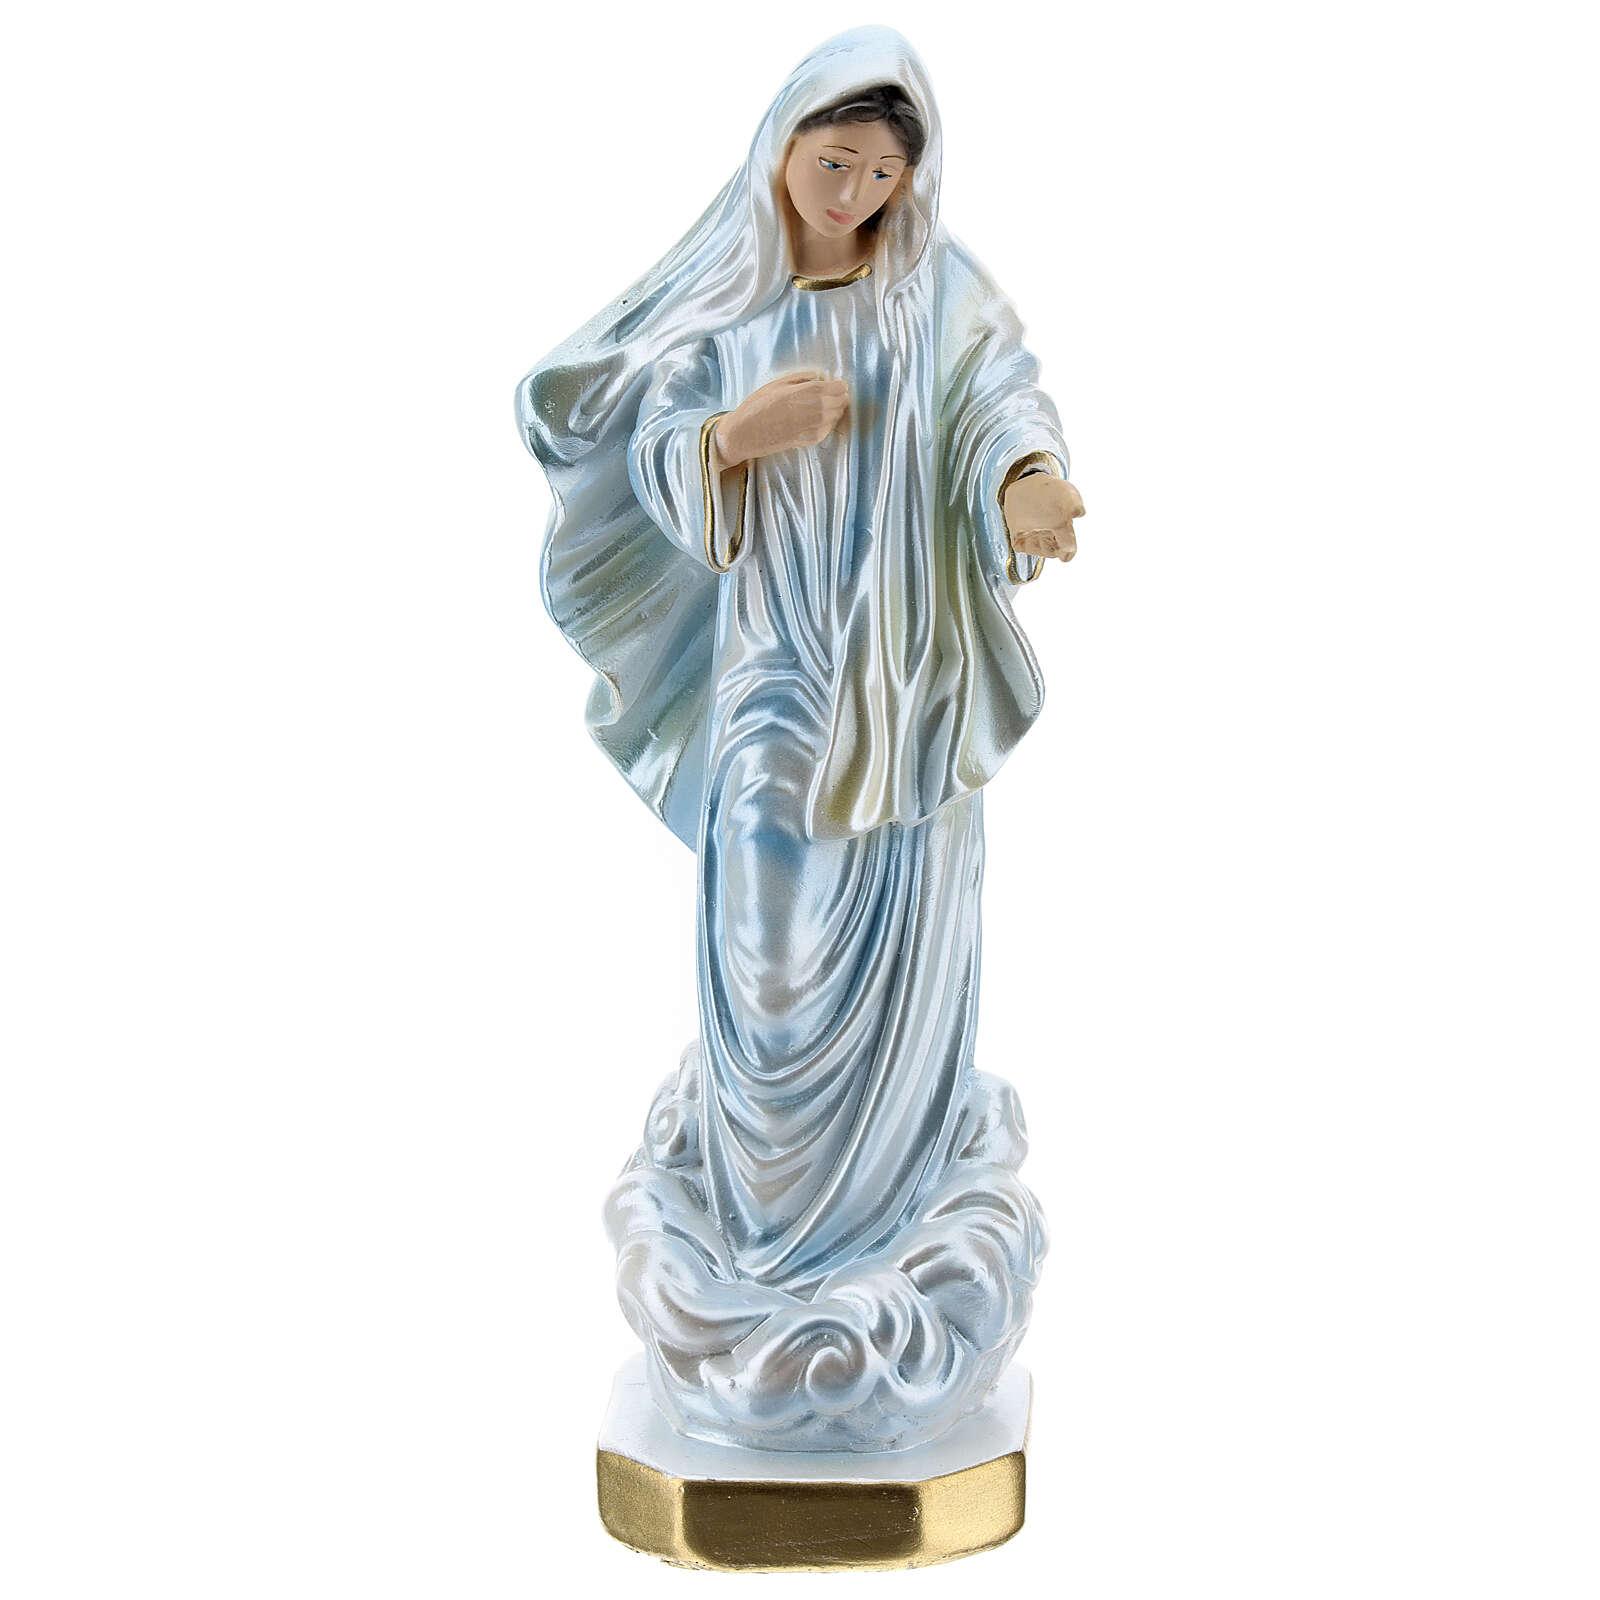 Estatua yeso nacarado Virgen de Medjugorje 20 cm 4